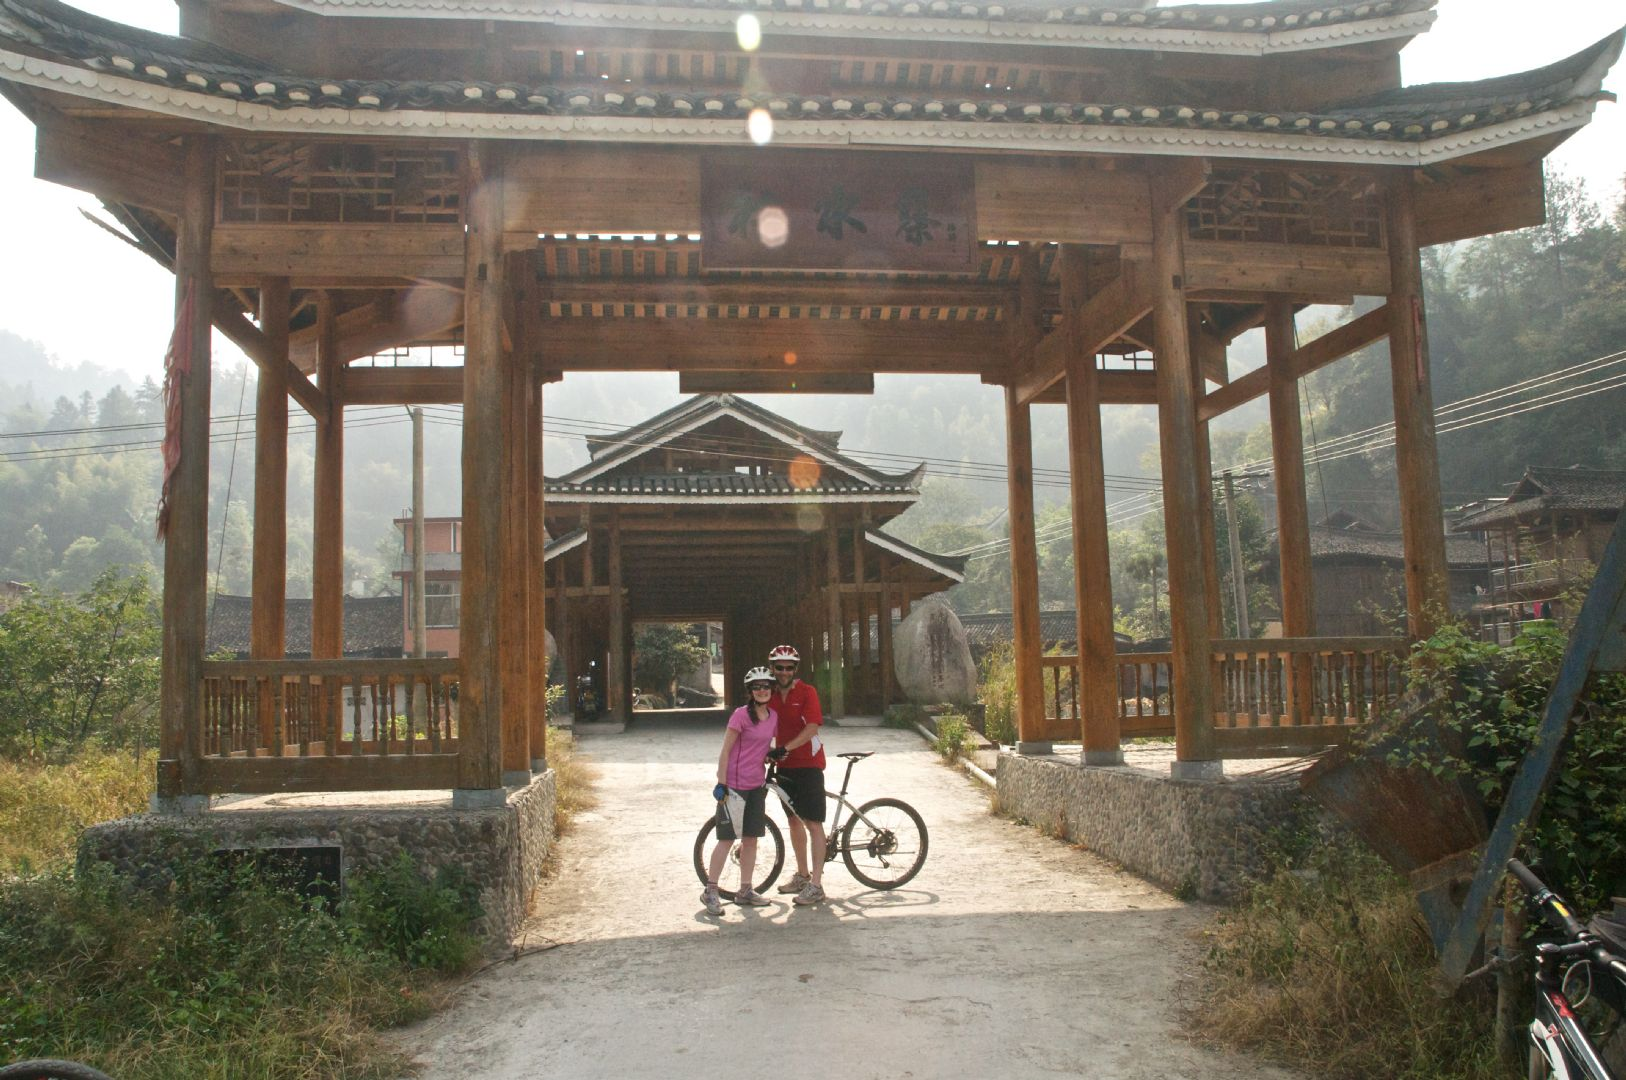 chinacyclingadventure31innesgarden.jpg - China - Guilin and Guangxi - Cycling Adventures